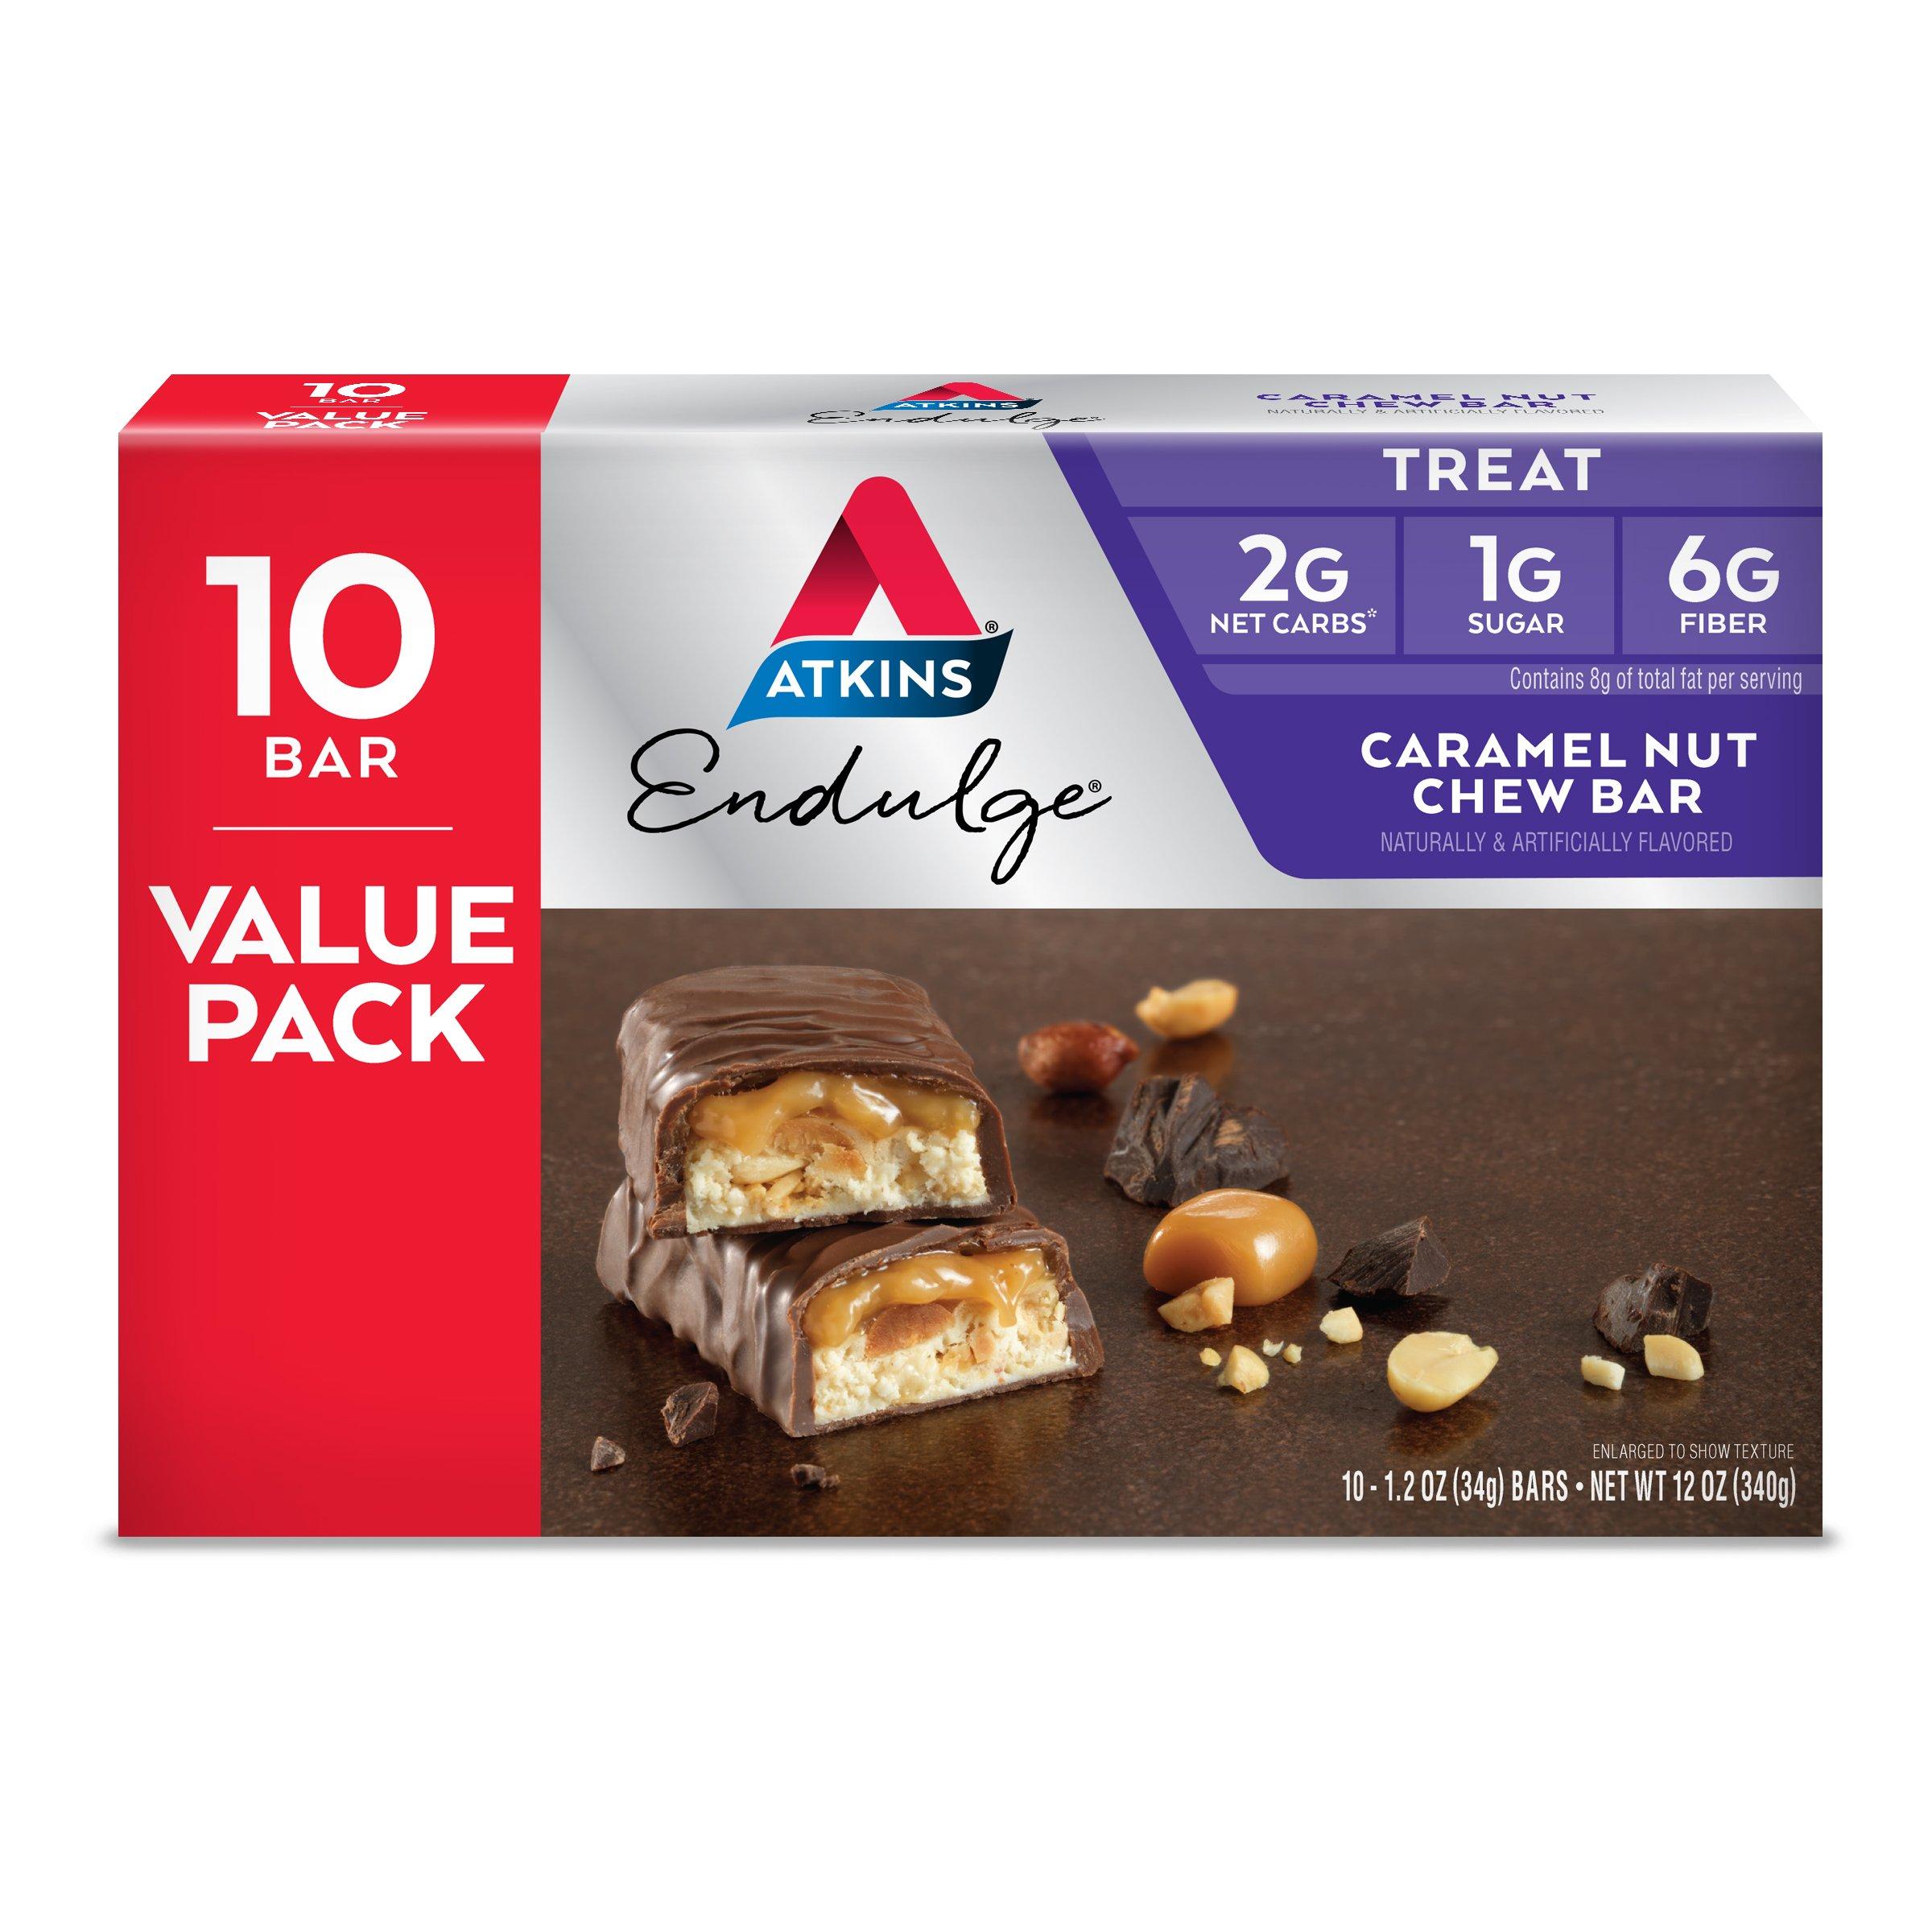 Atkins Endulge Treat, Caramel Nut Chew Bar, 10 Count